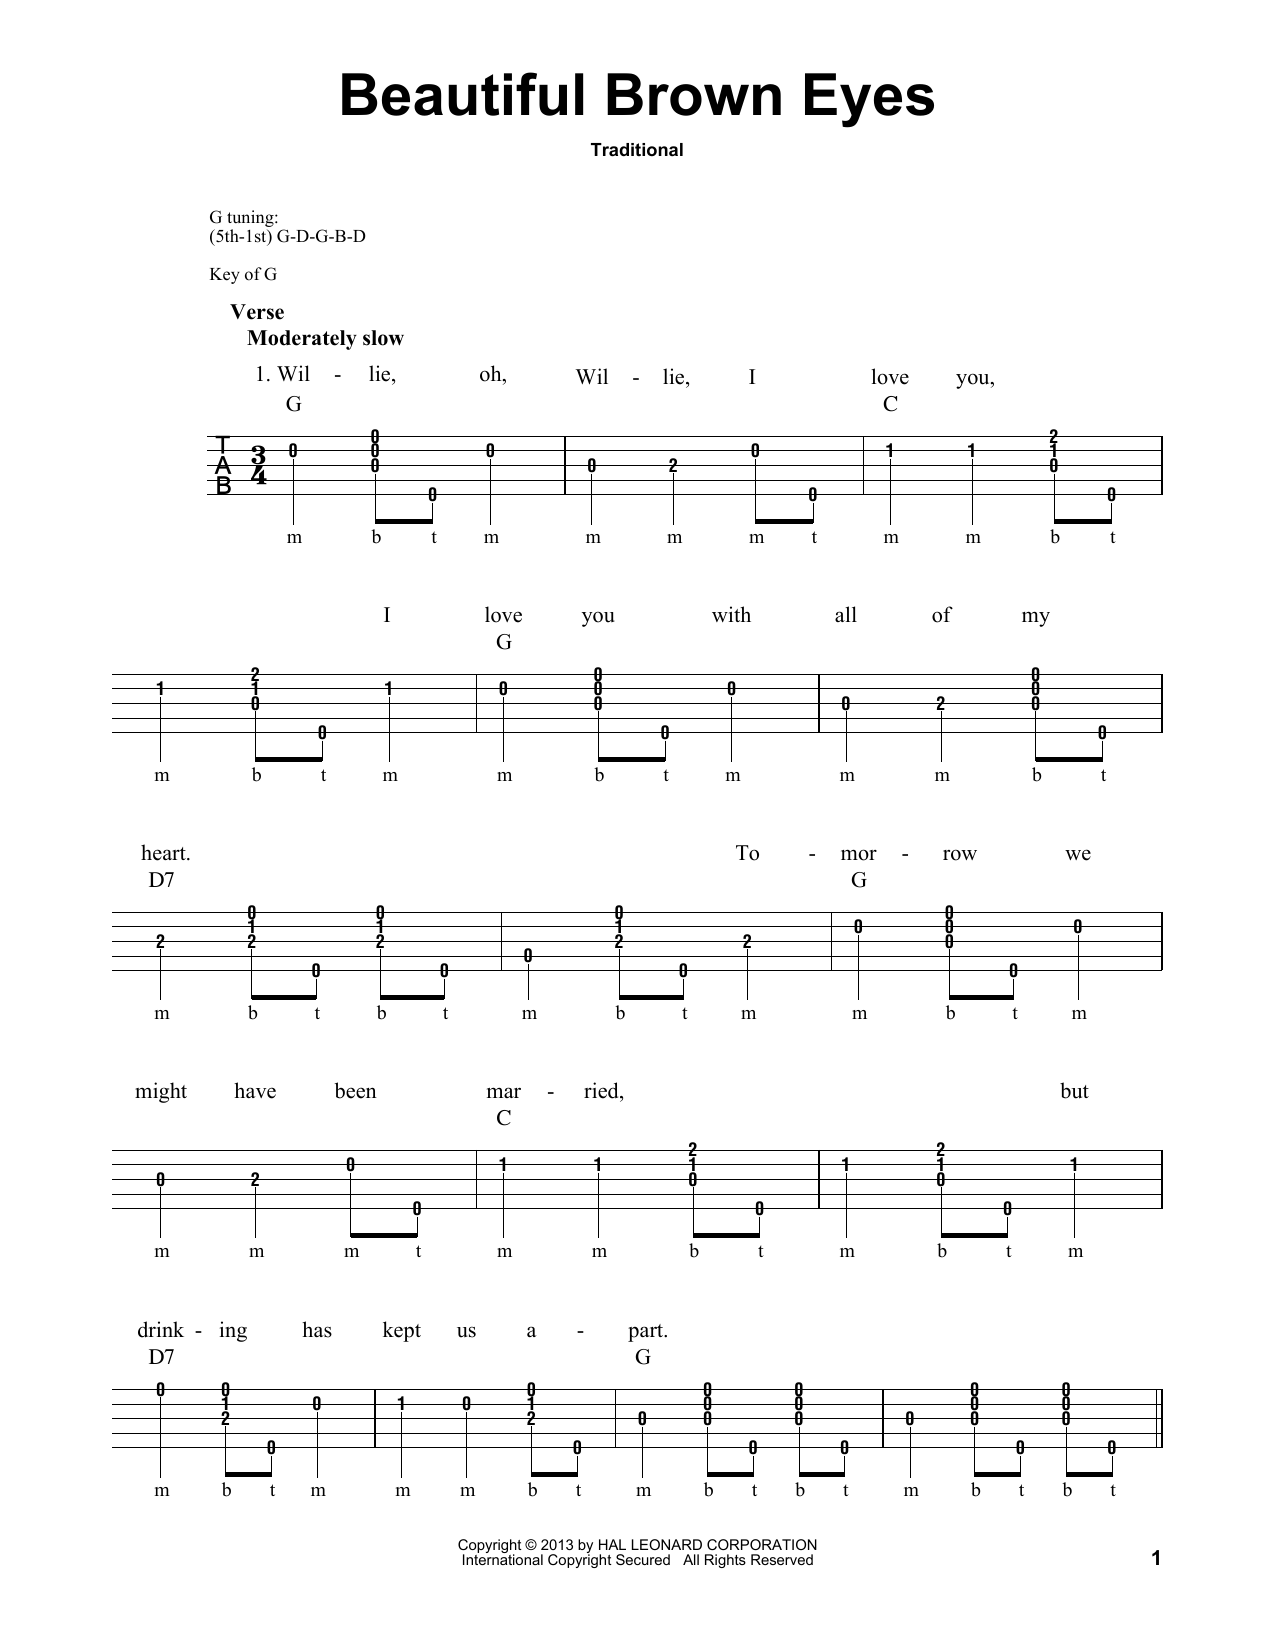 Traditional Beautiful Brown Eyes Sheet Music Notes Chords